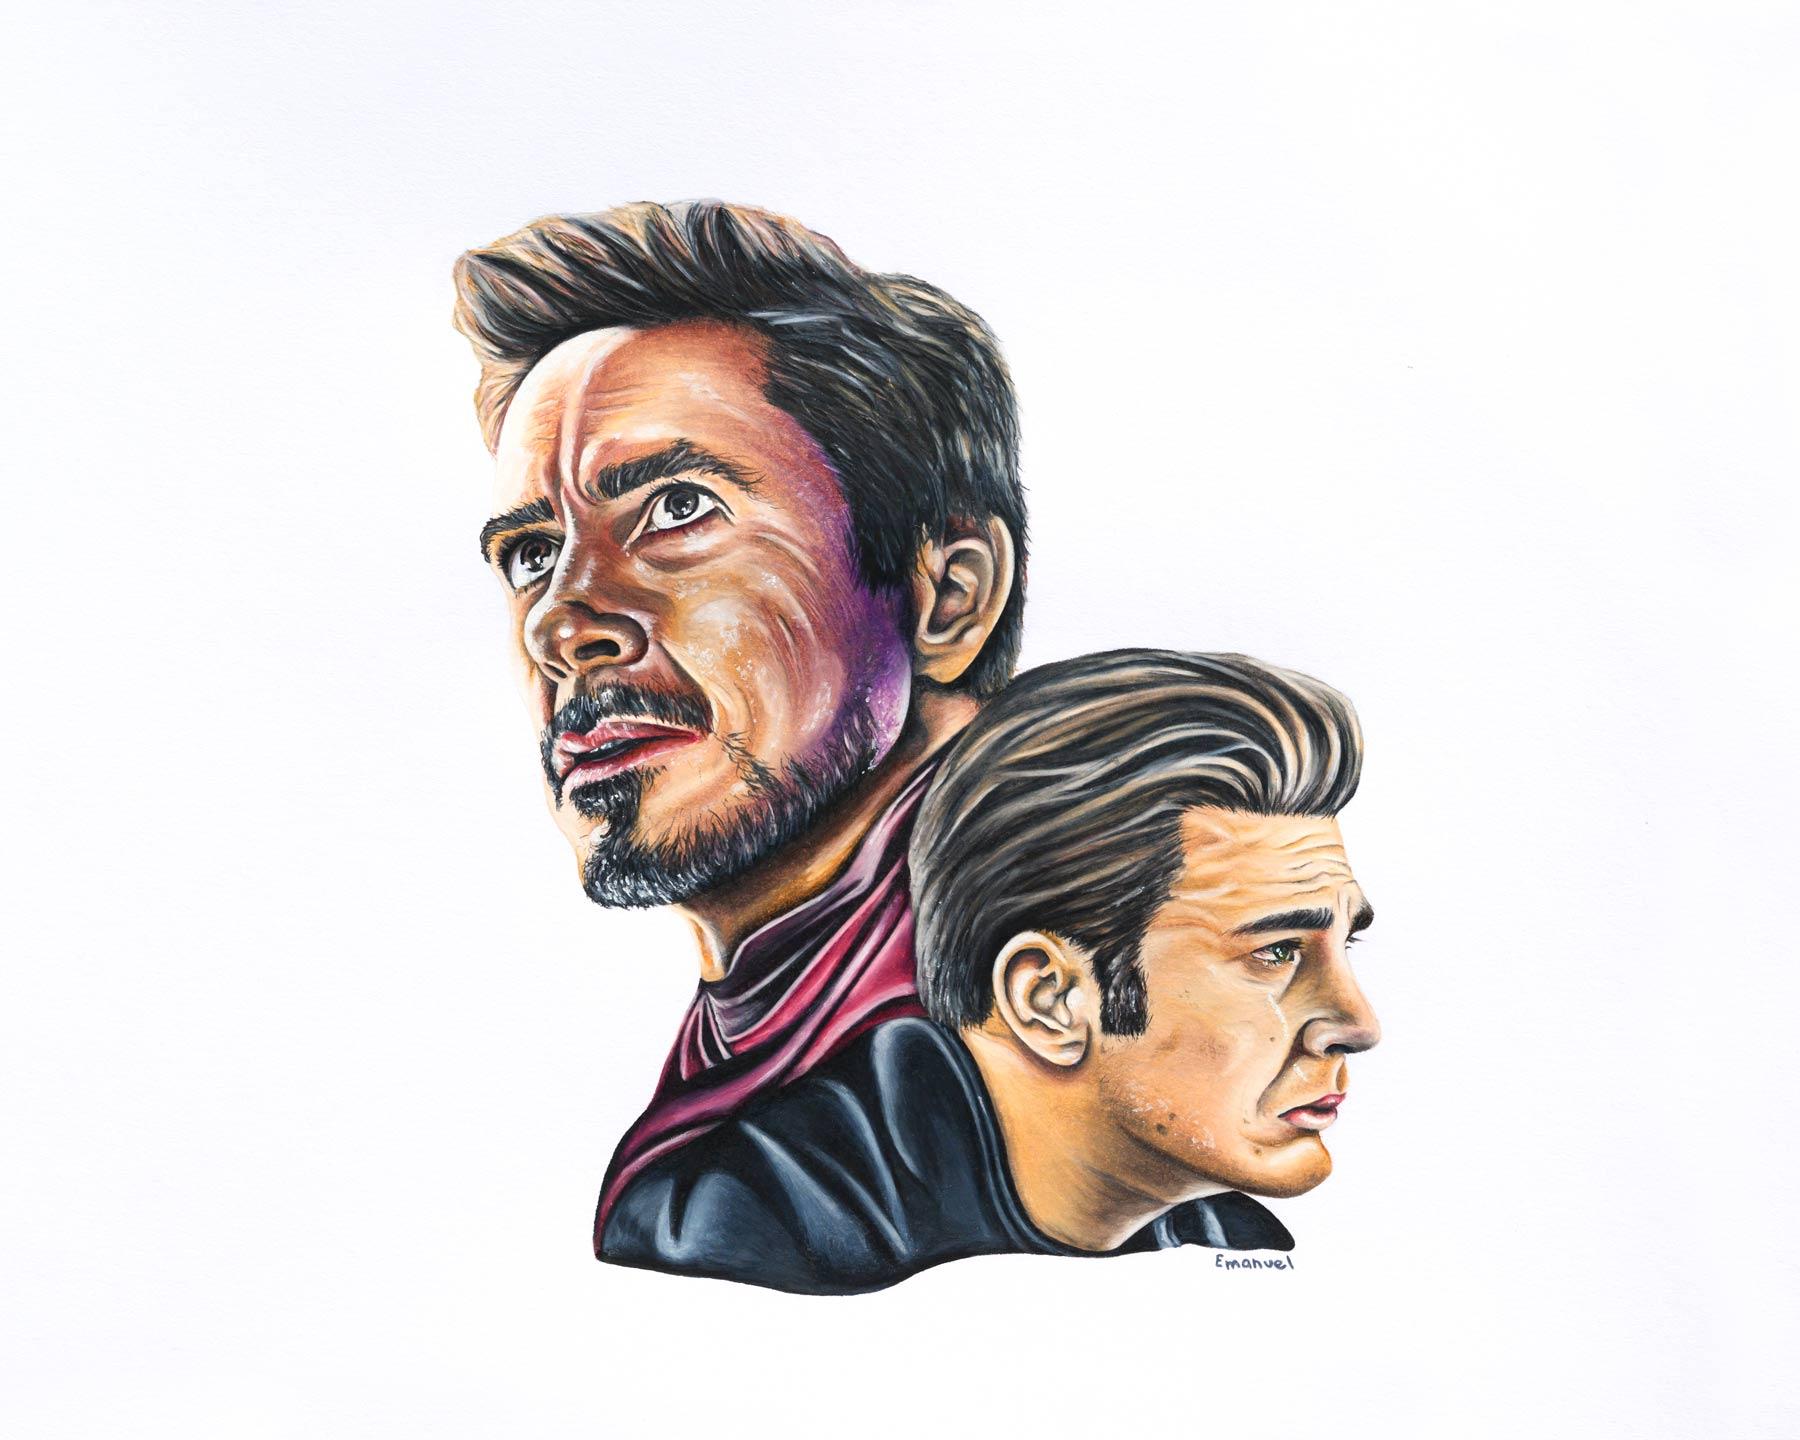 Avengers Endgame by emanuel schweizer